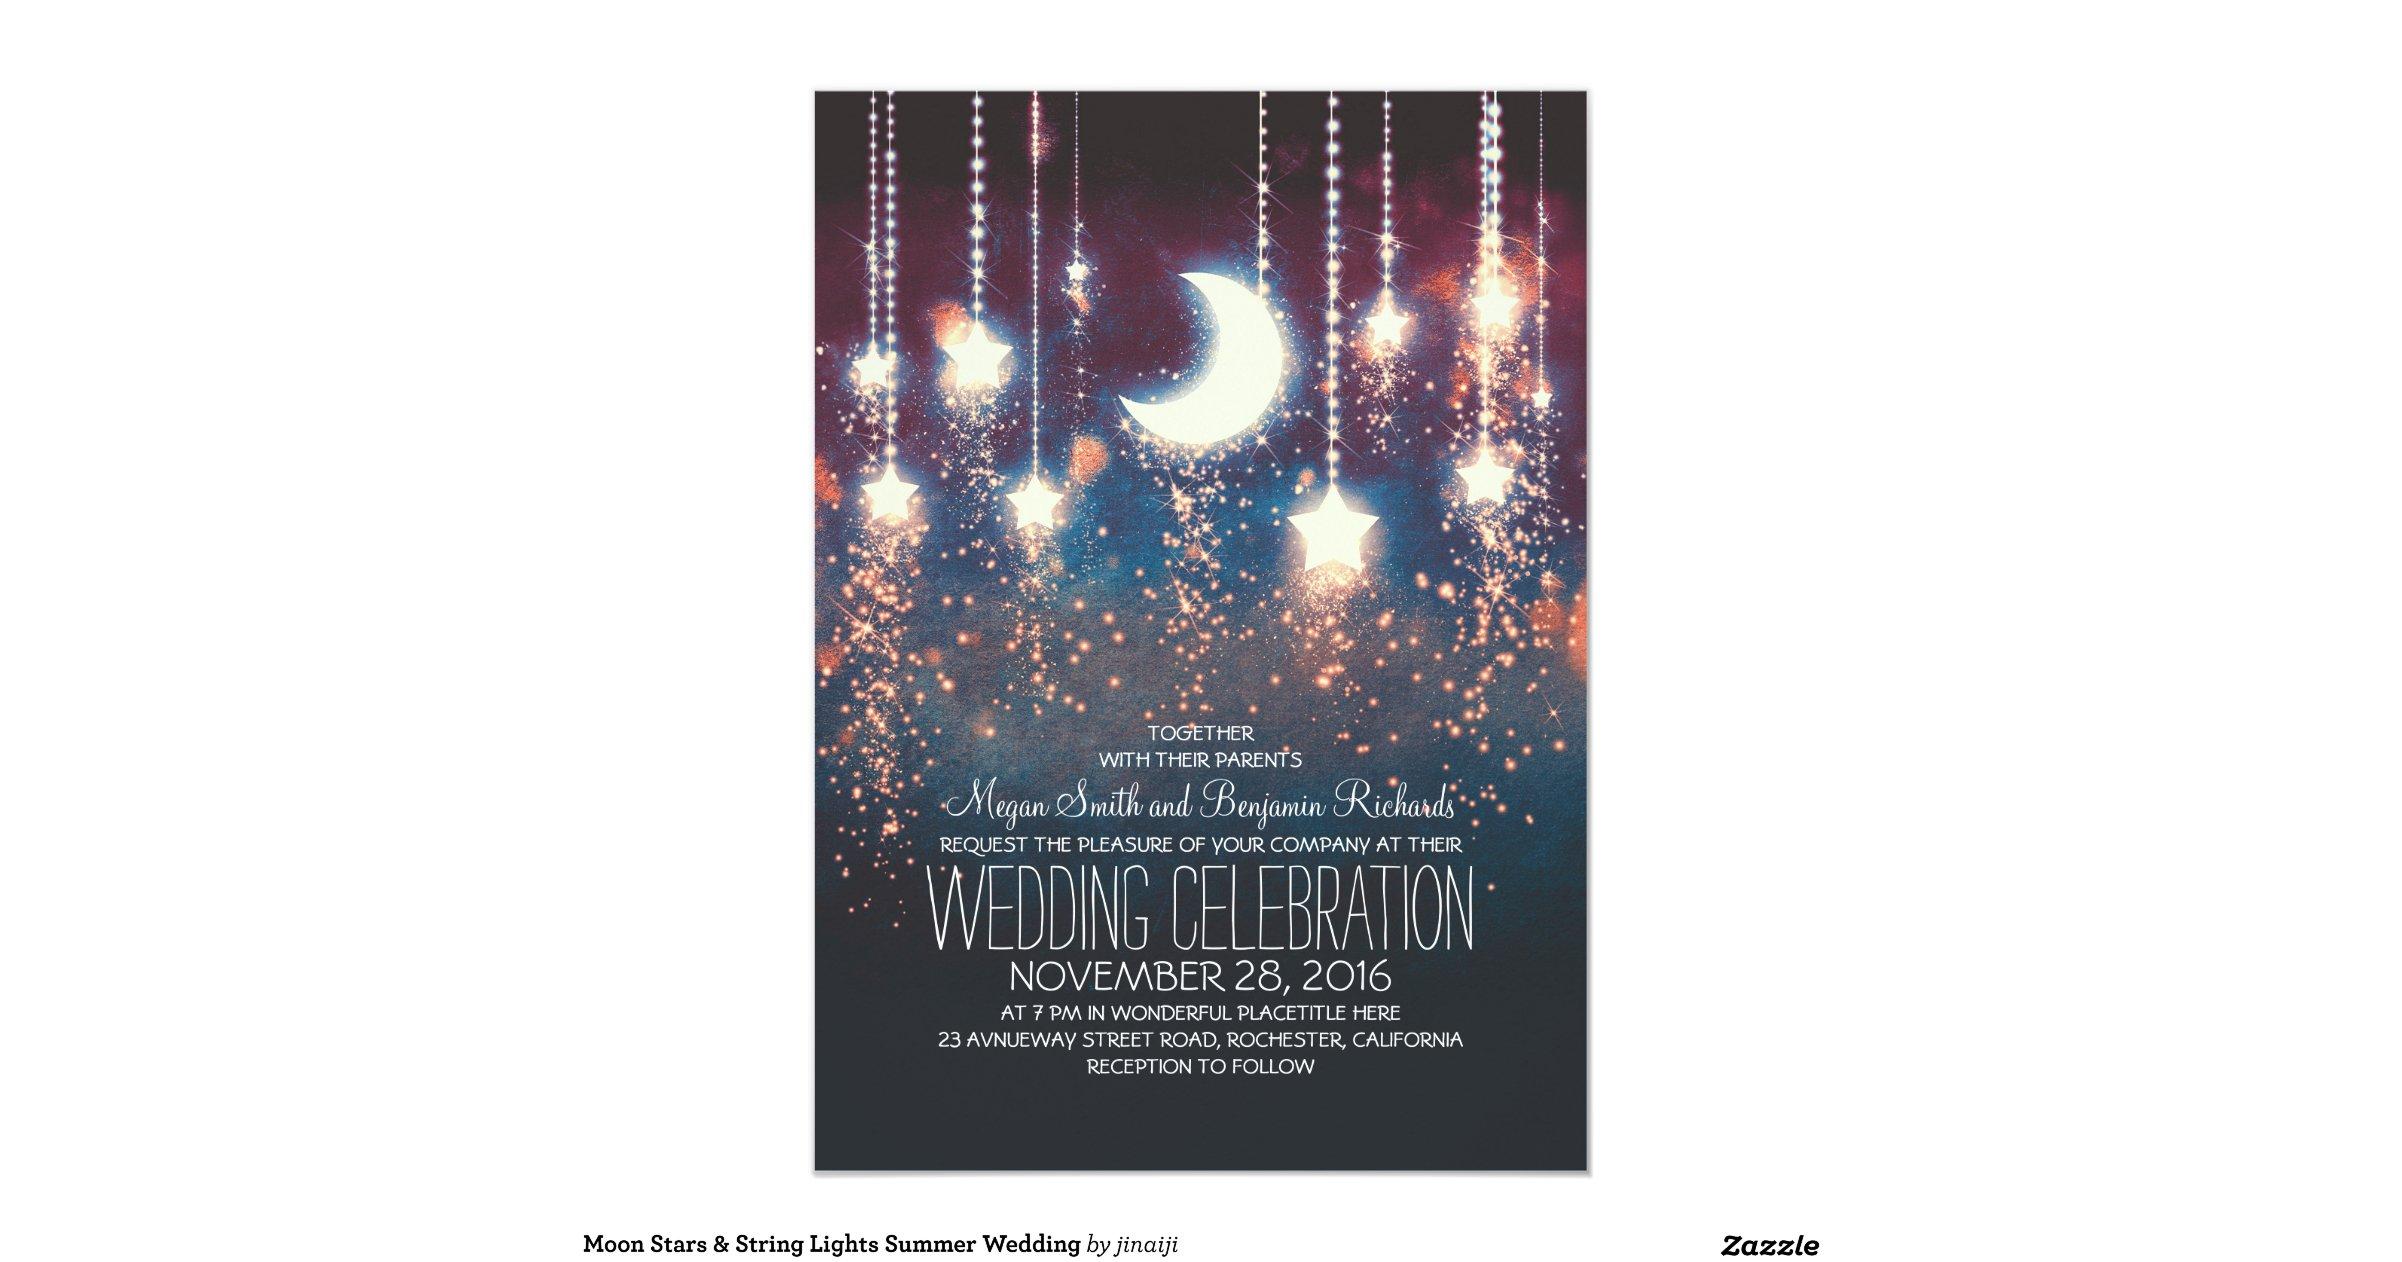 Zazzle String Lights : moon_stars_string_lights_wedding_invitations-r1877402d08334e4f90e5ec087f8a452e_zkrqs_1200.jpg ...